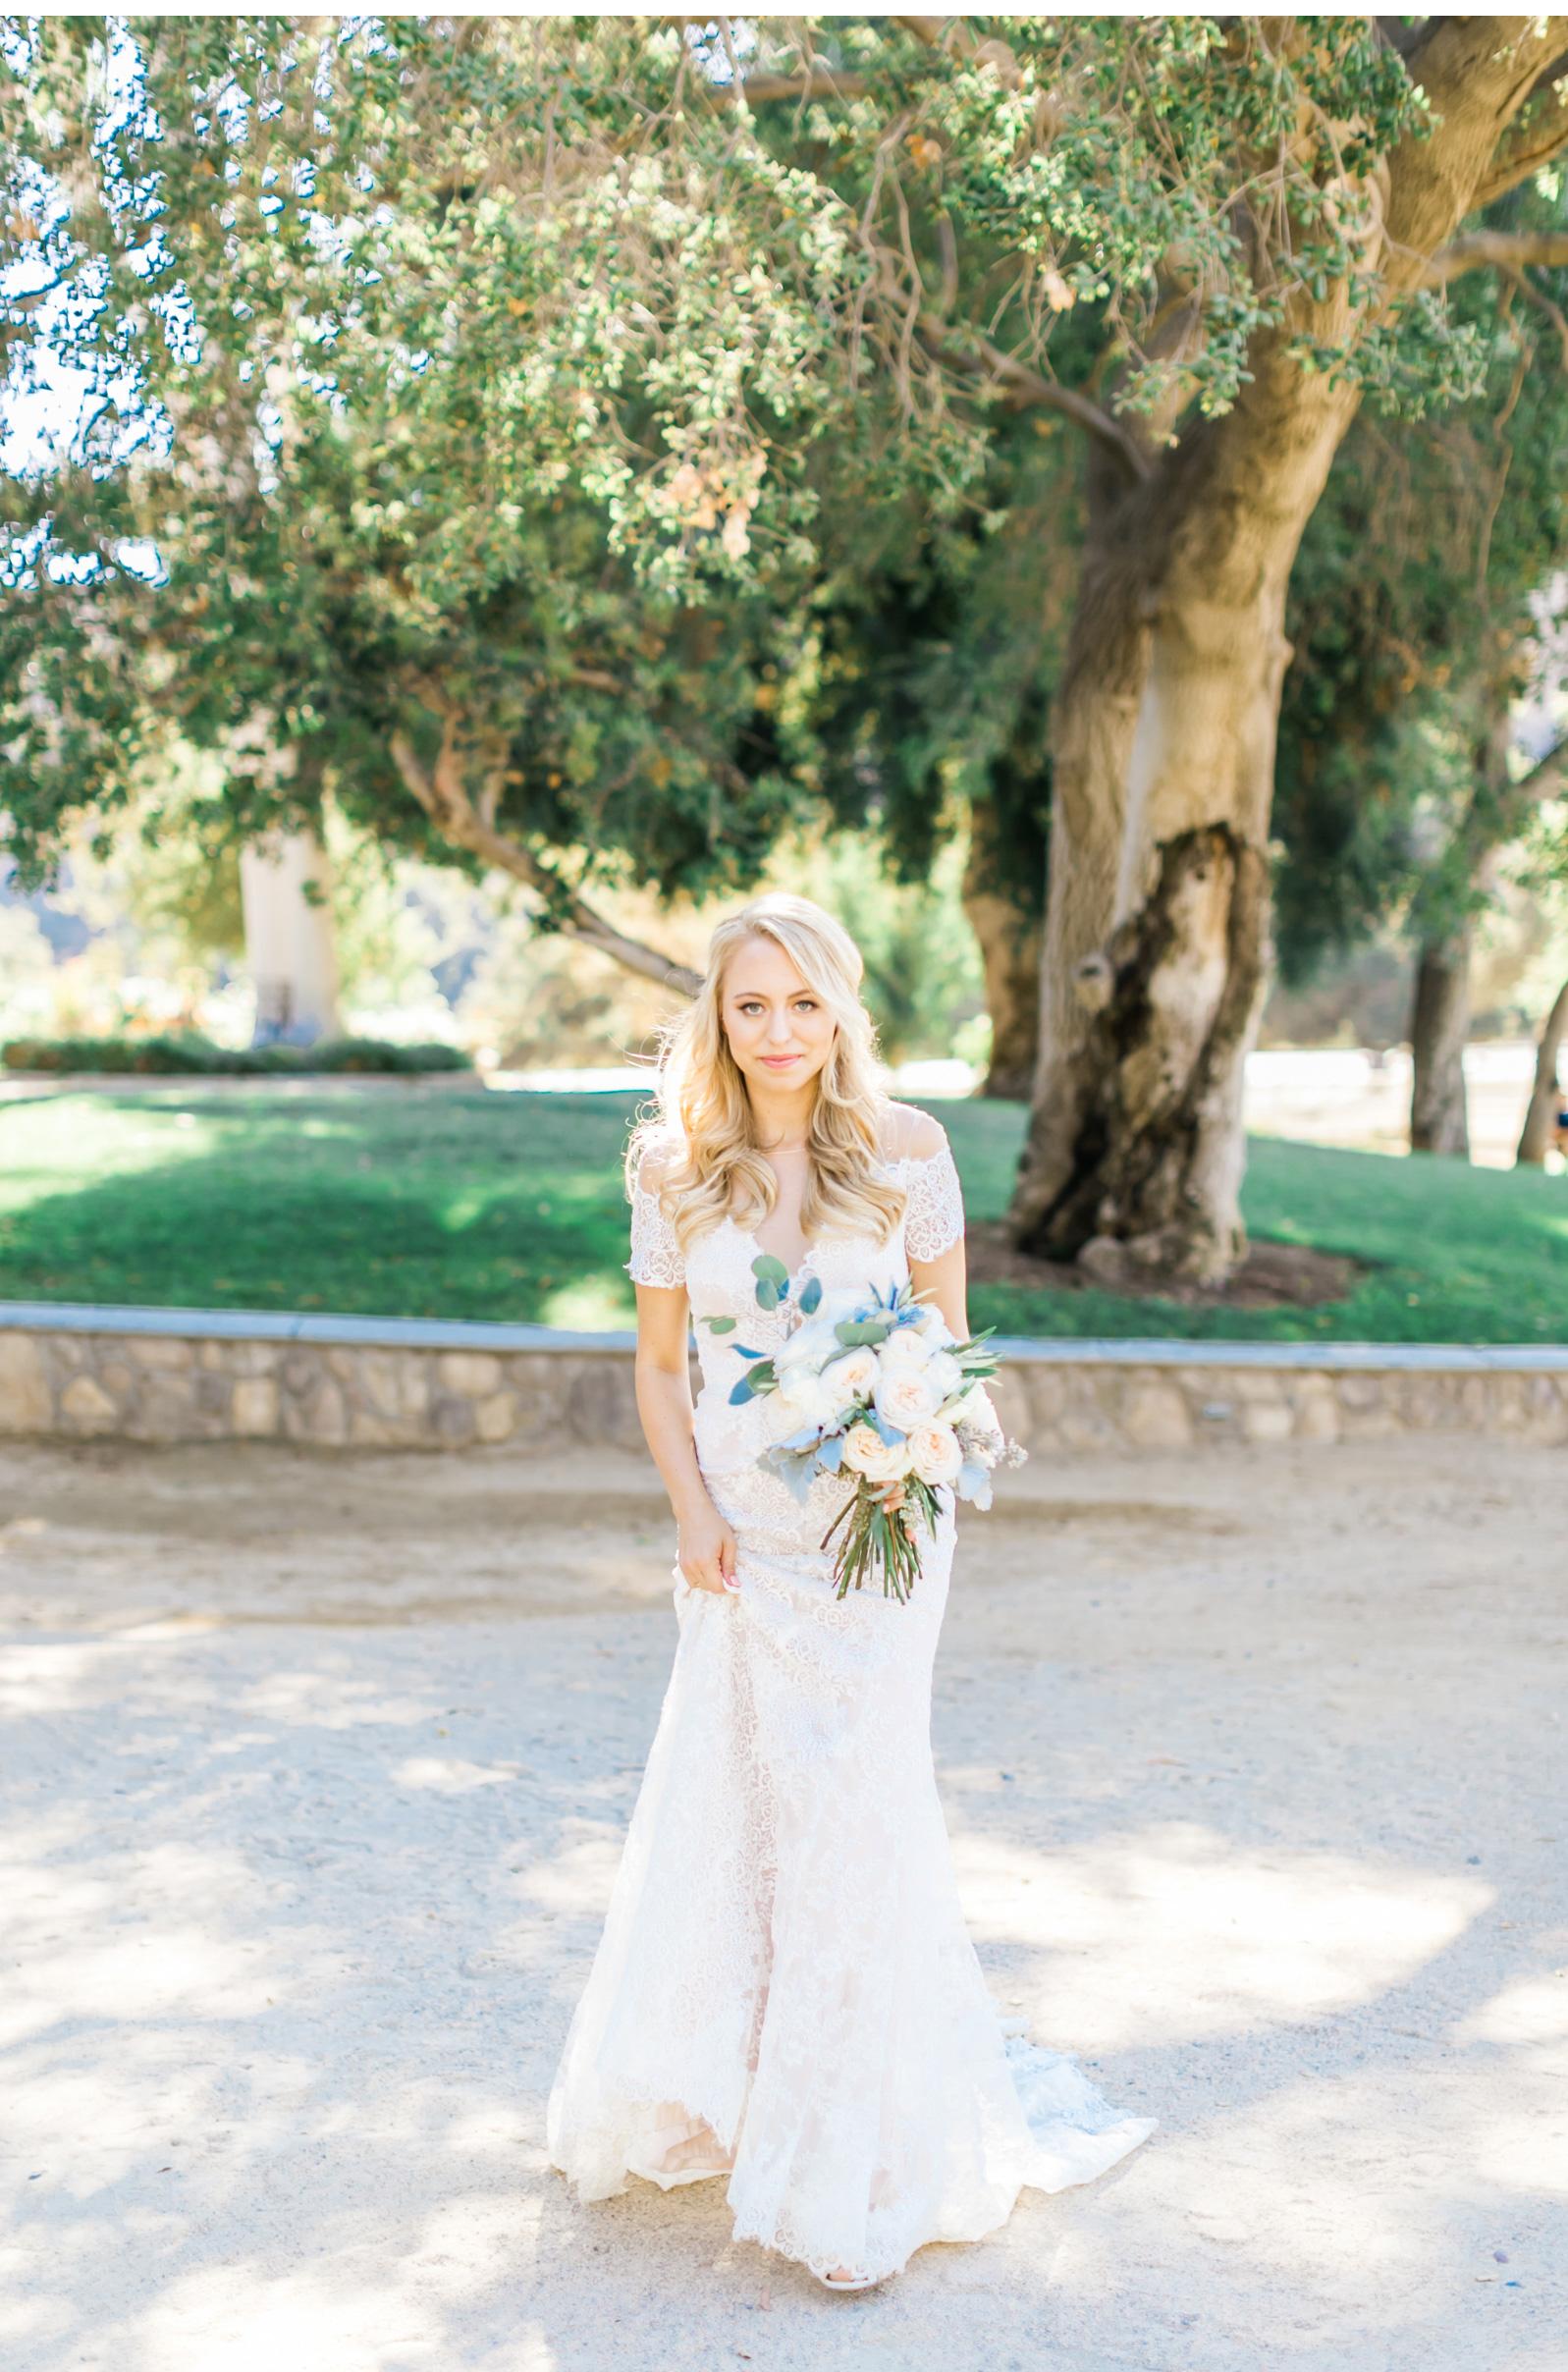 Temecula-Wedding-Photographer-Style-Me-Pretty-Natalie-Schutt-Photography_17.jpg